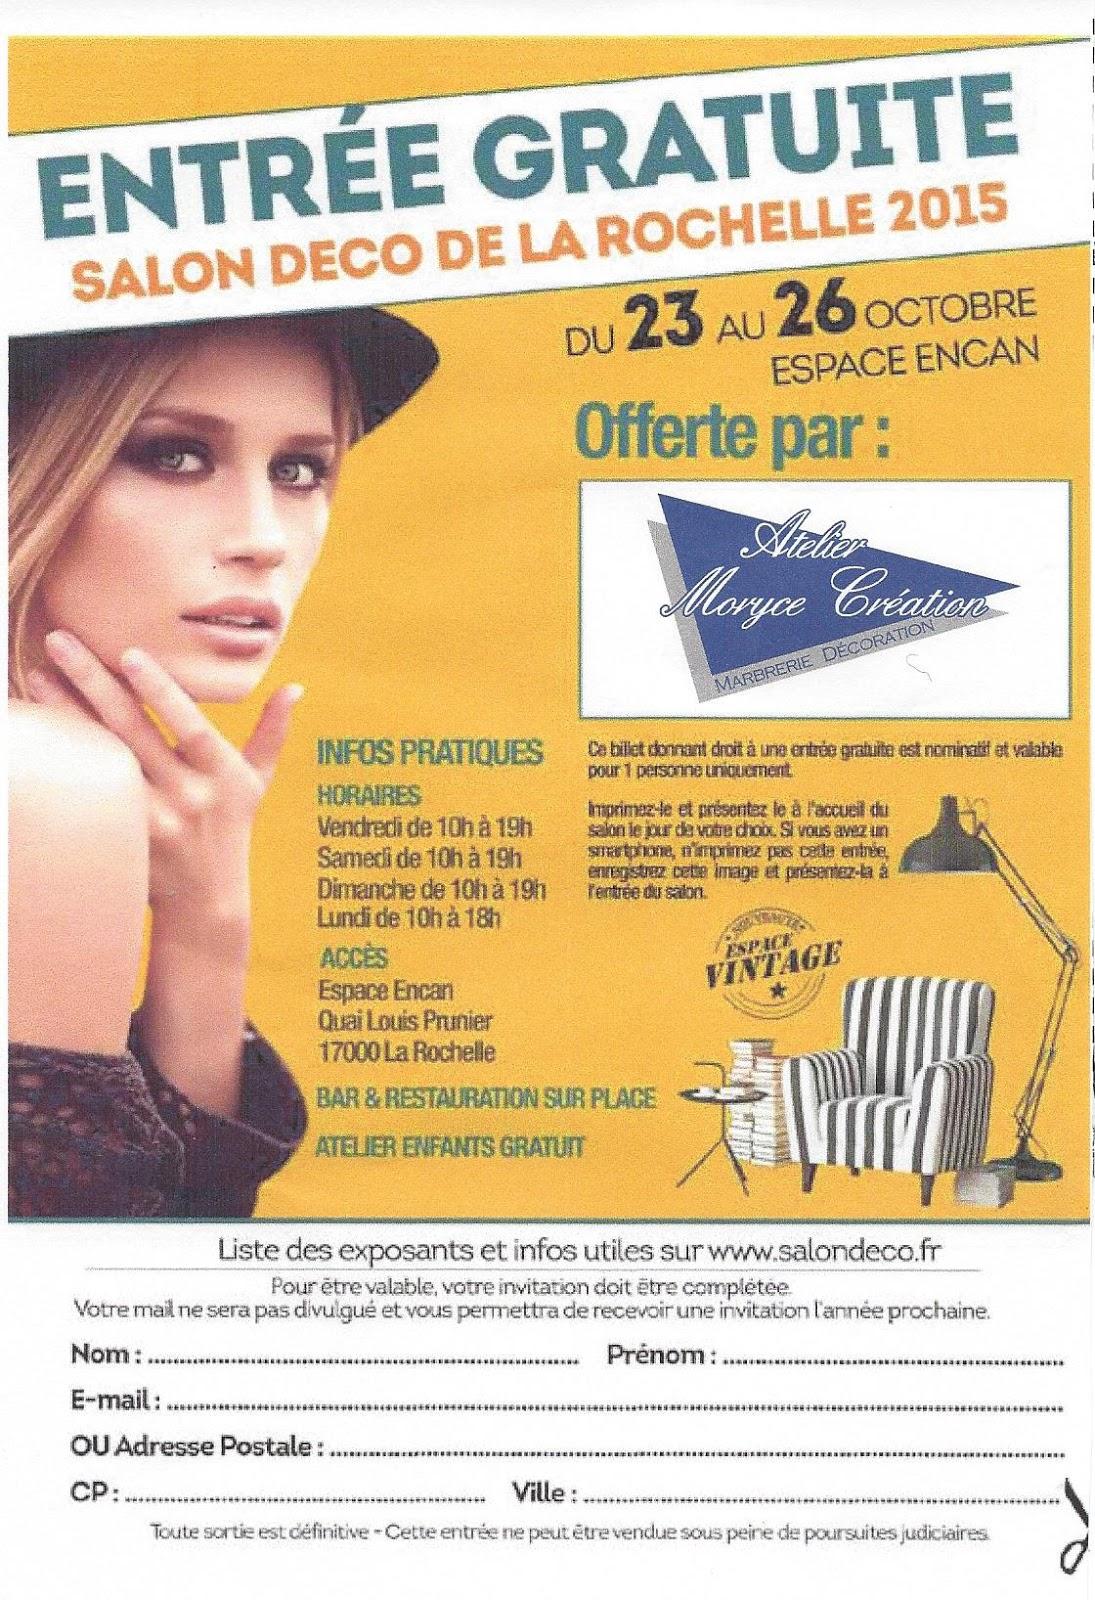 L 39 atelier moryce creation marbrerie d coration invitation gratuite su salon de la d co de la - Salon de la deco ...